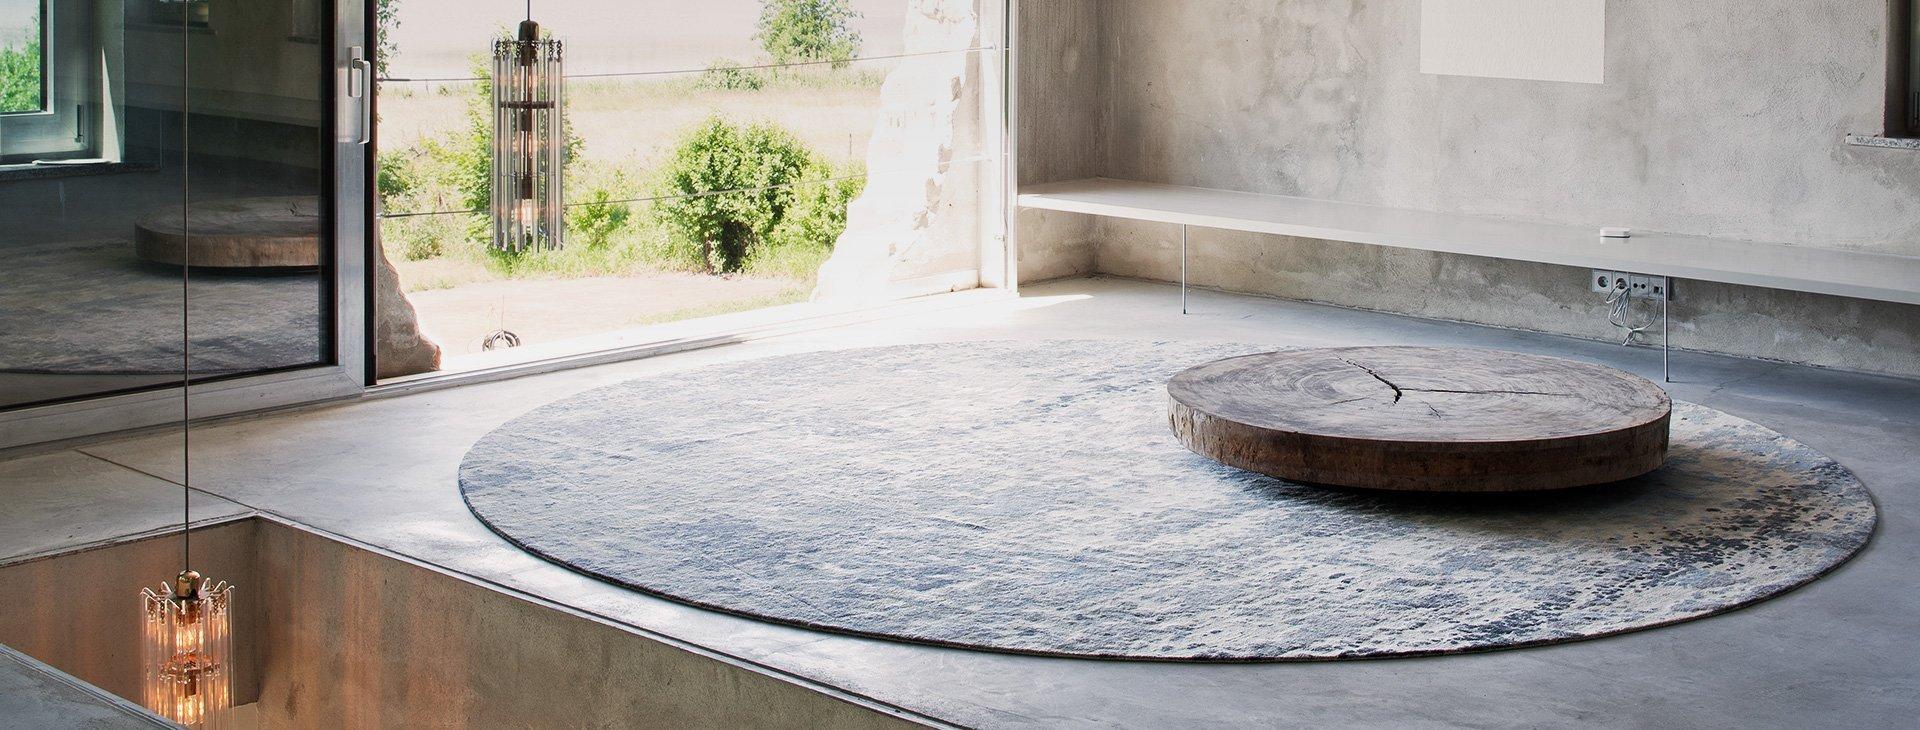 nyhues ihre brands im stilwerk berlin. Black Bedroom Furniture Sets. Home Design Ideas